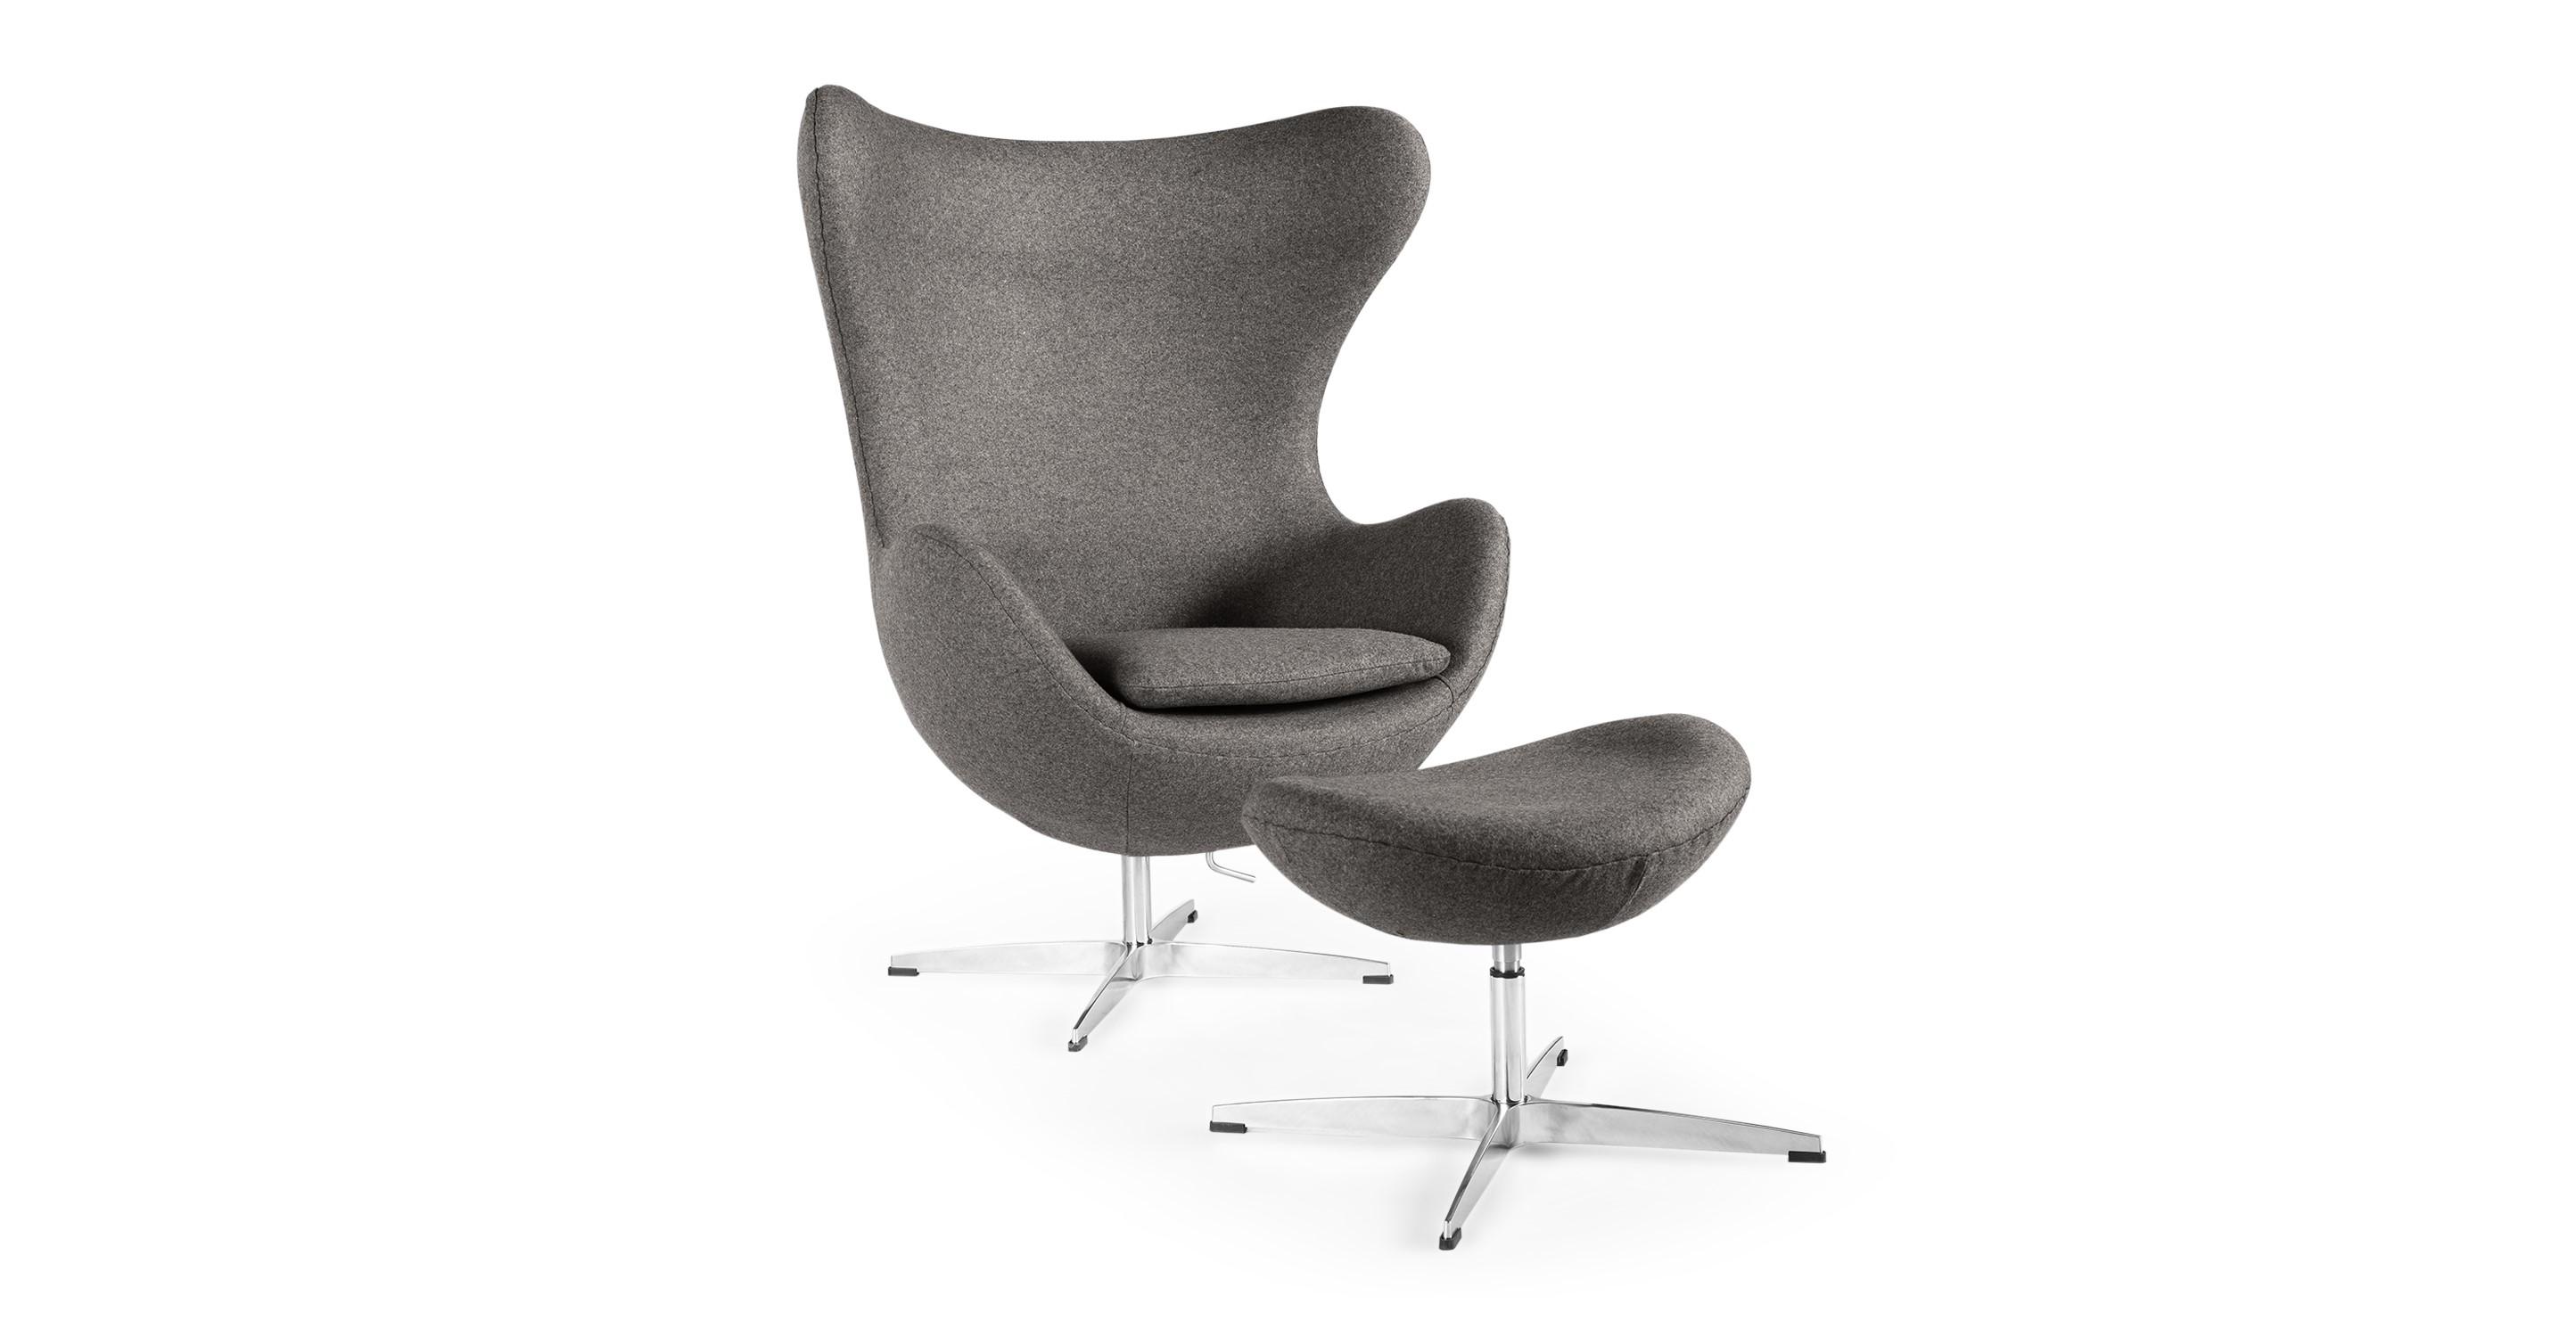 Amoeba Swivel Fabric Chair & Ottoman, Cadet Grey